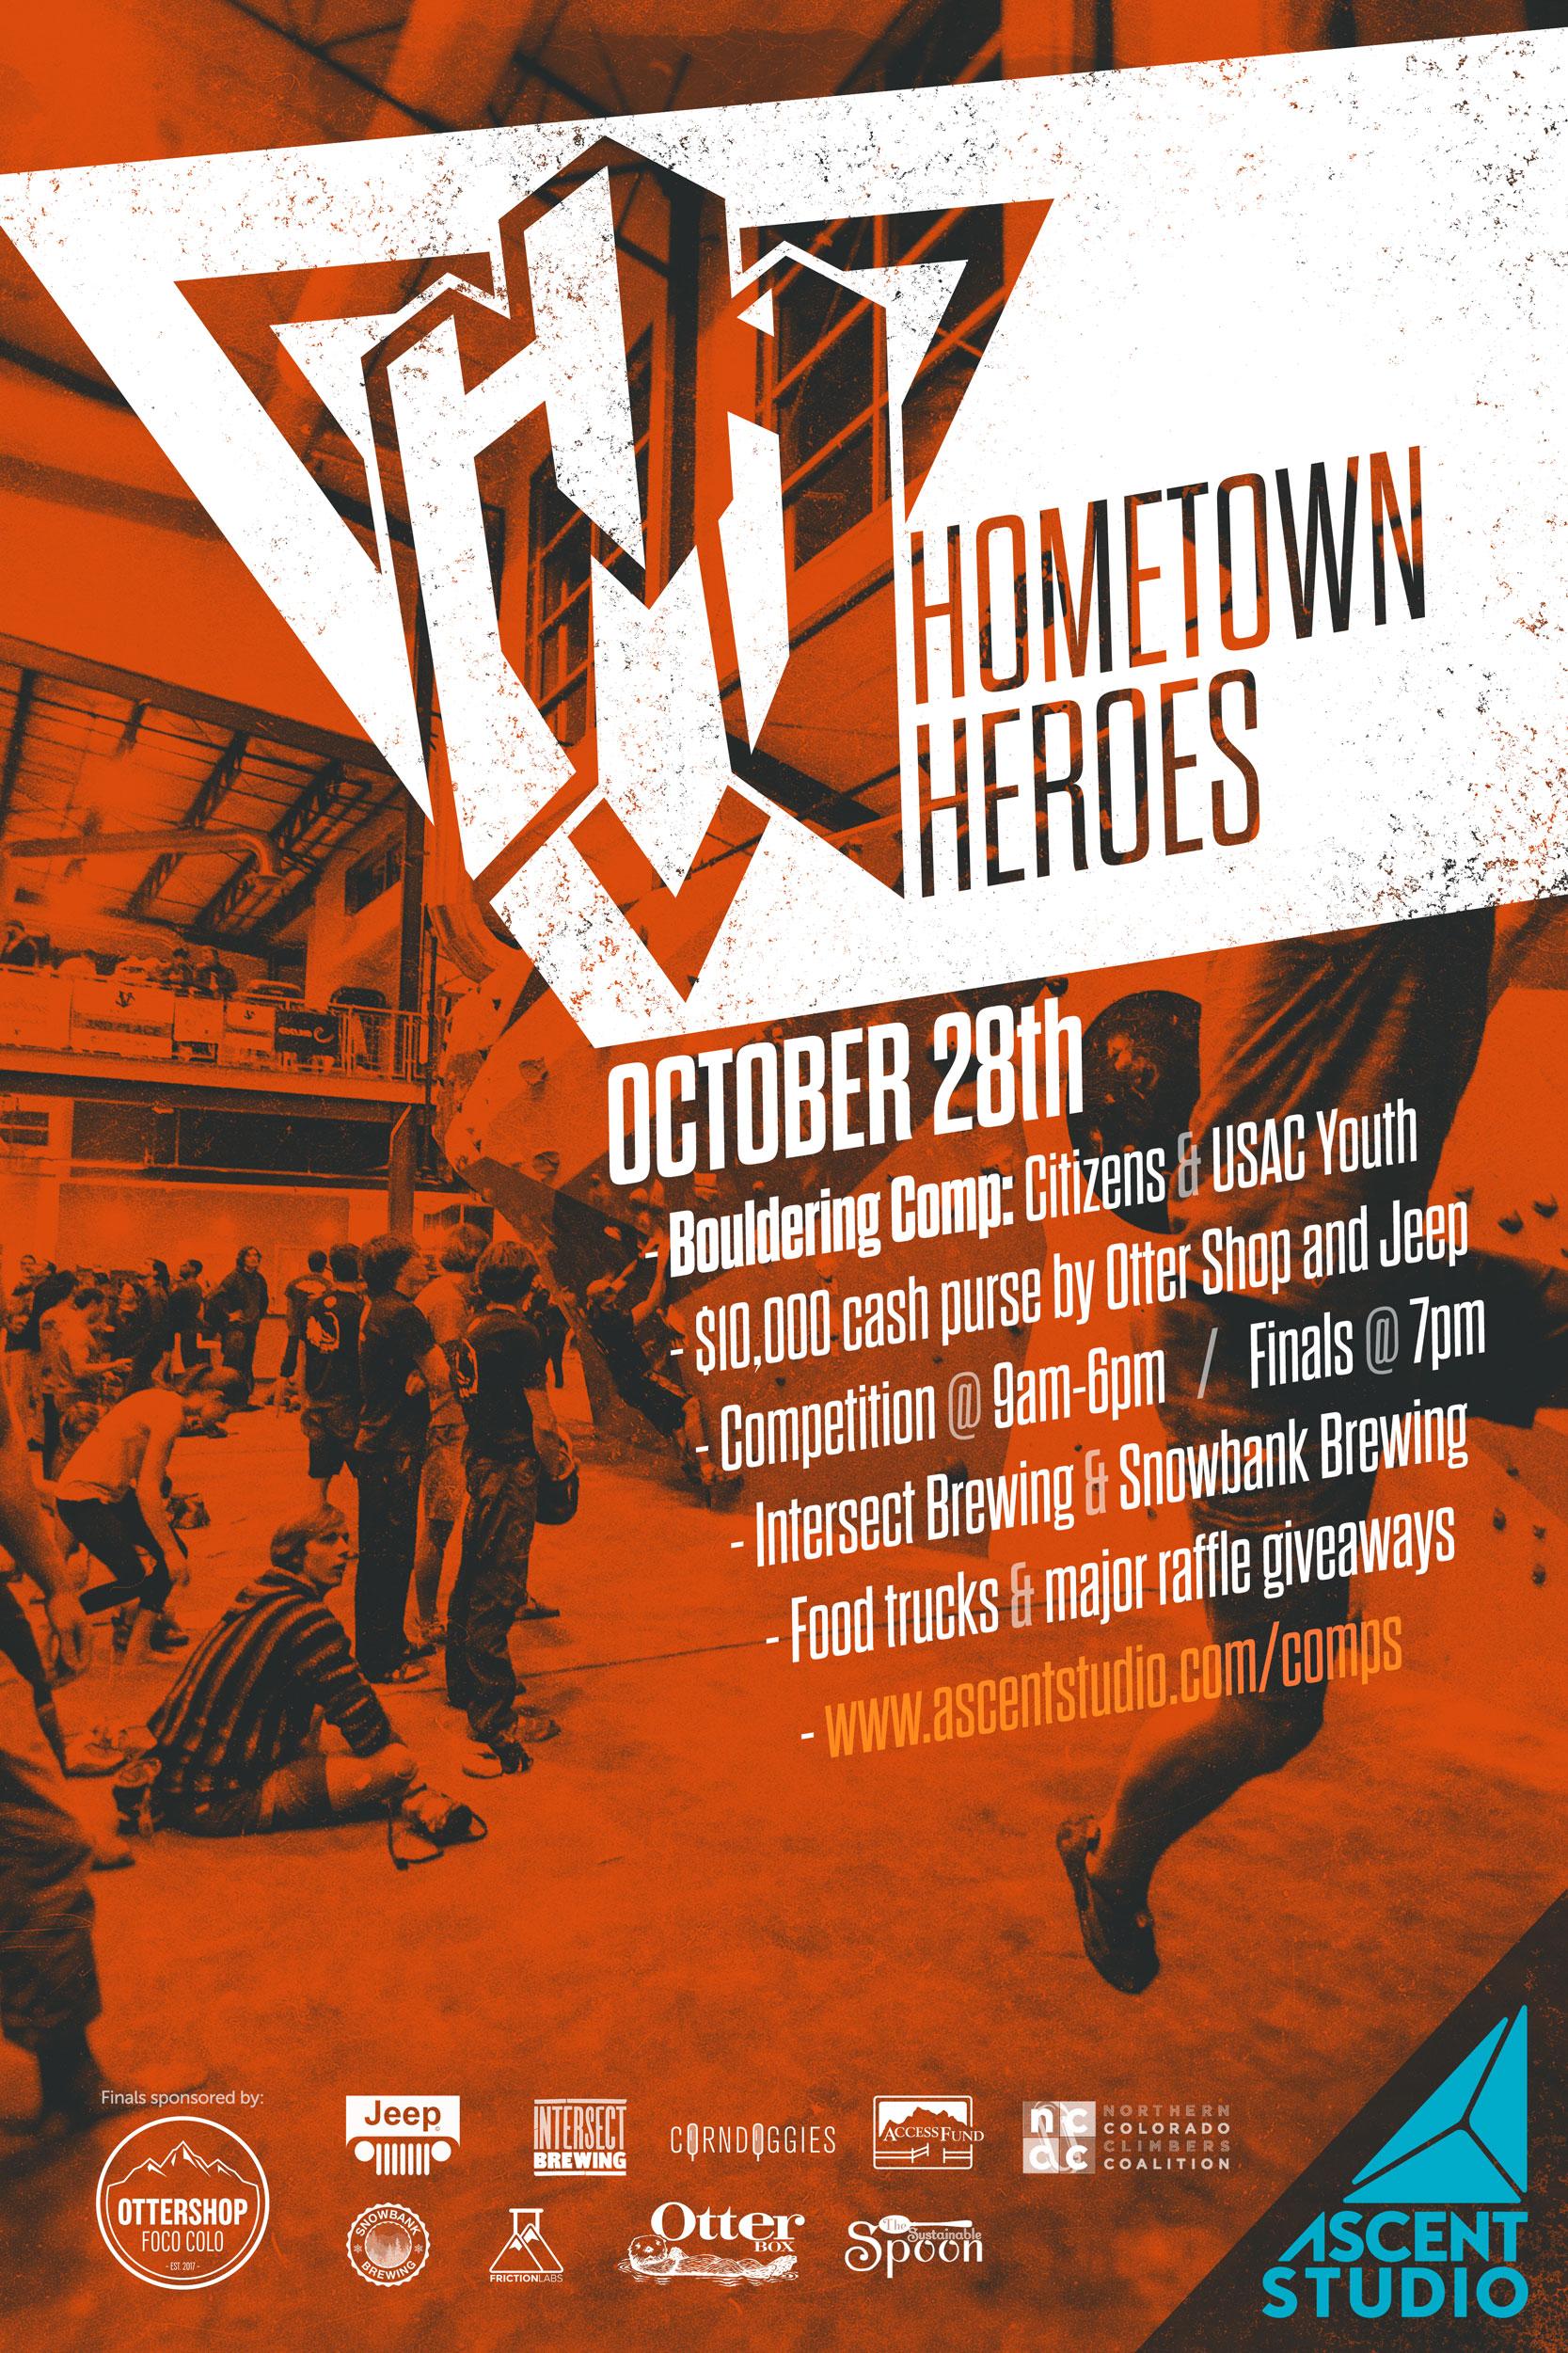 1524 - Hometown Heroes Poster v3 - Social